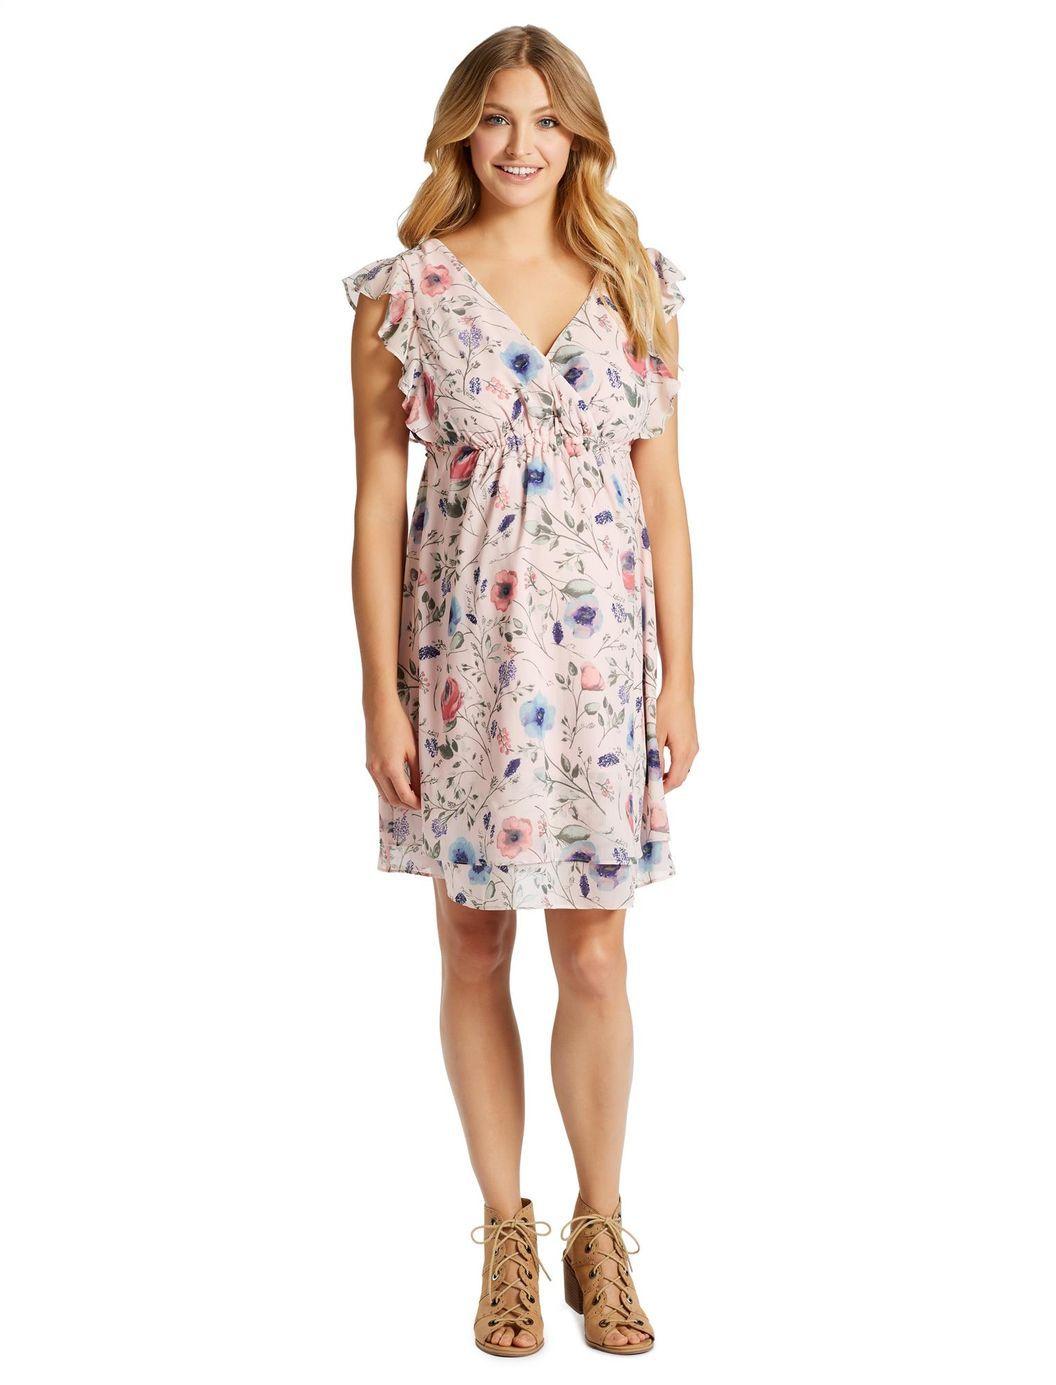 81bdbca3addf3 Jessica Simpson Ruffle Front Maternity Dress